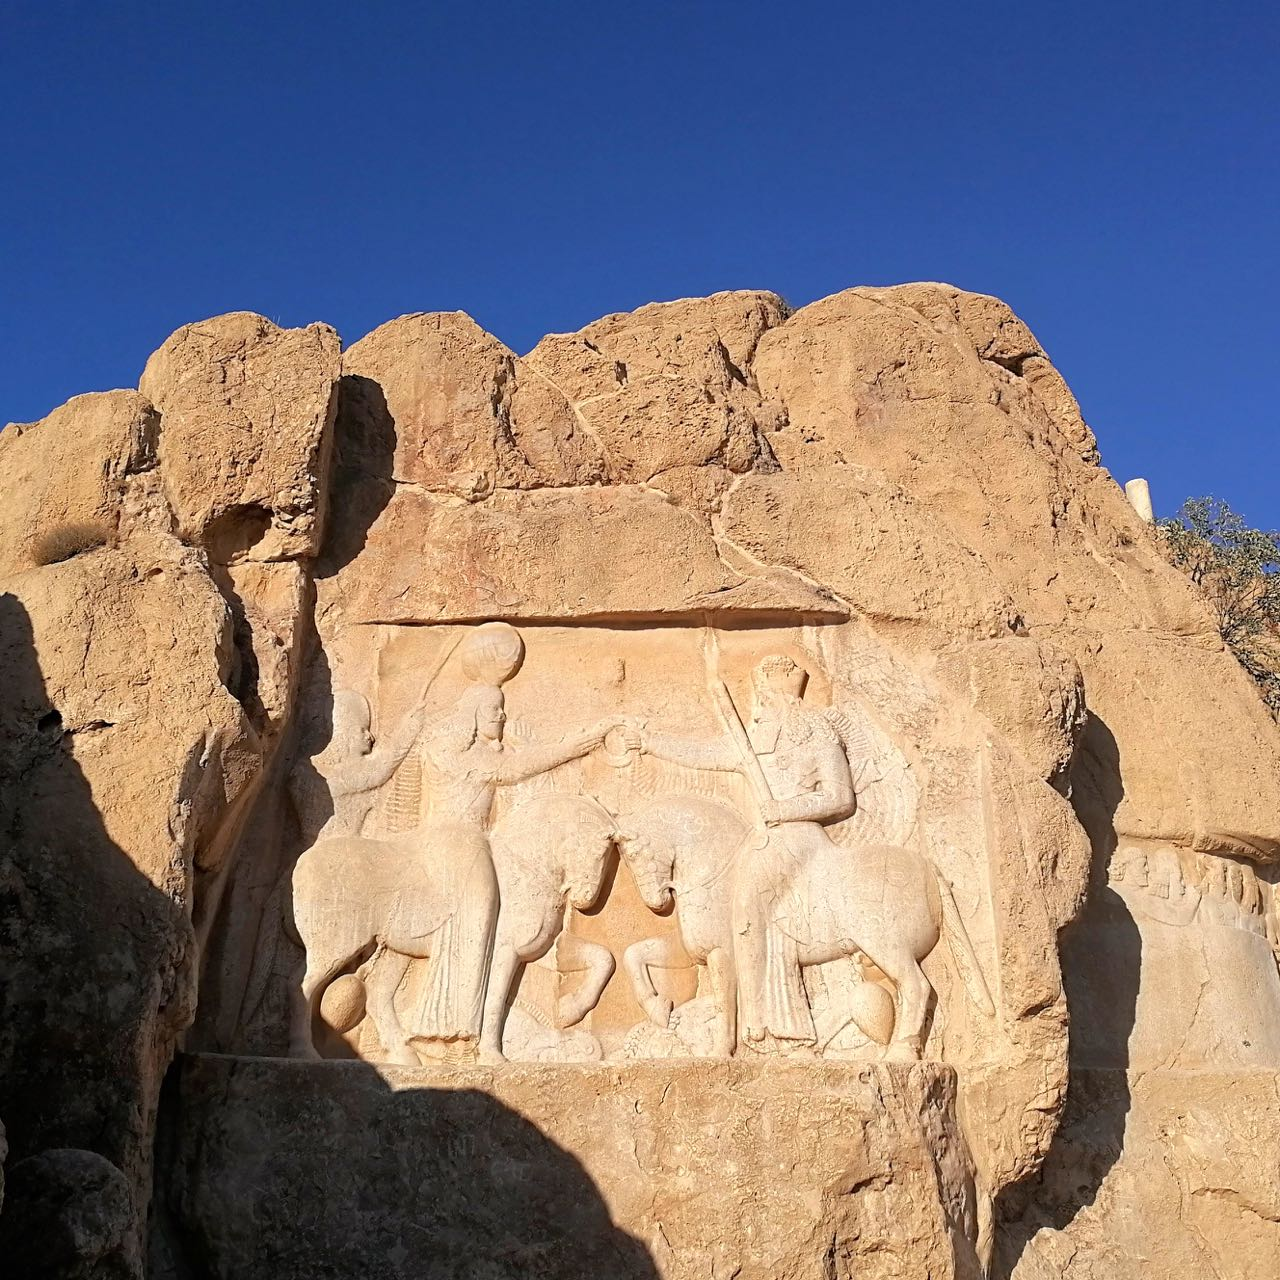 Iran-Persepolis-Necropolis-carving.jpg